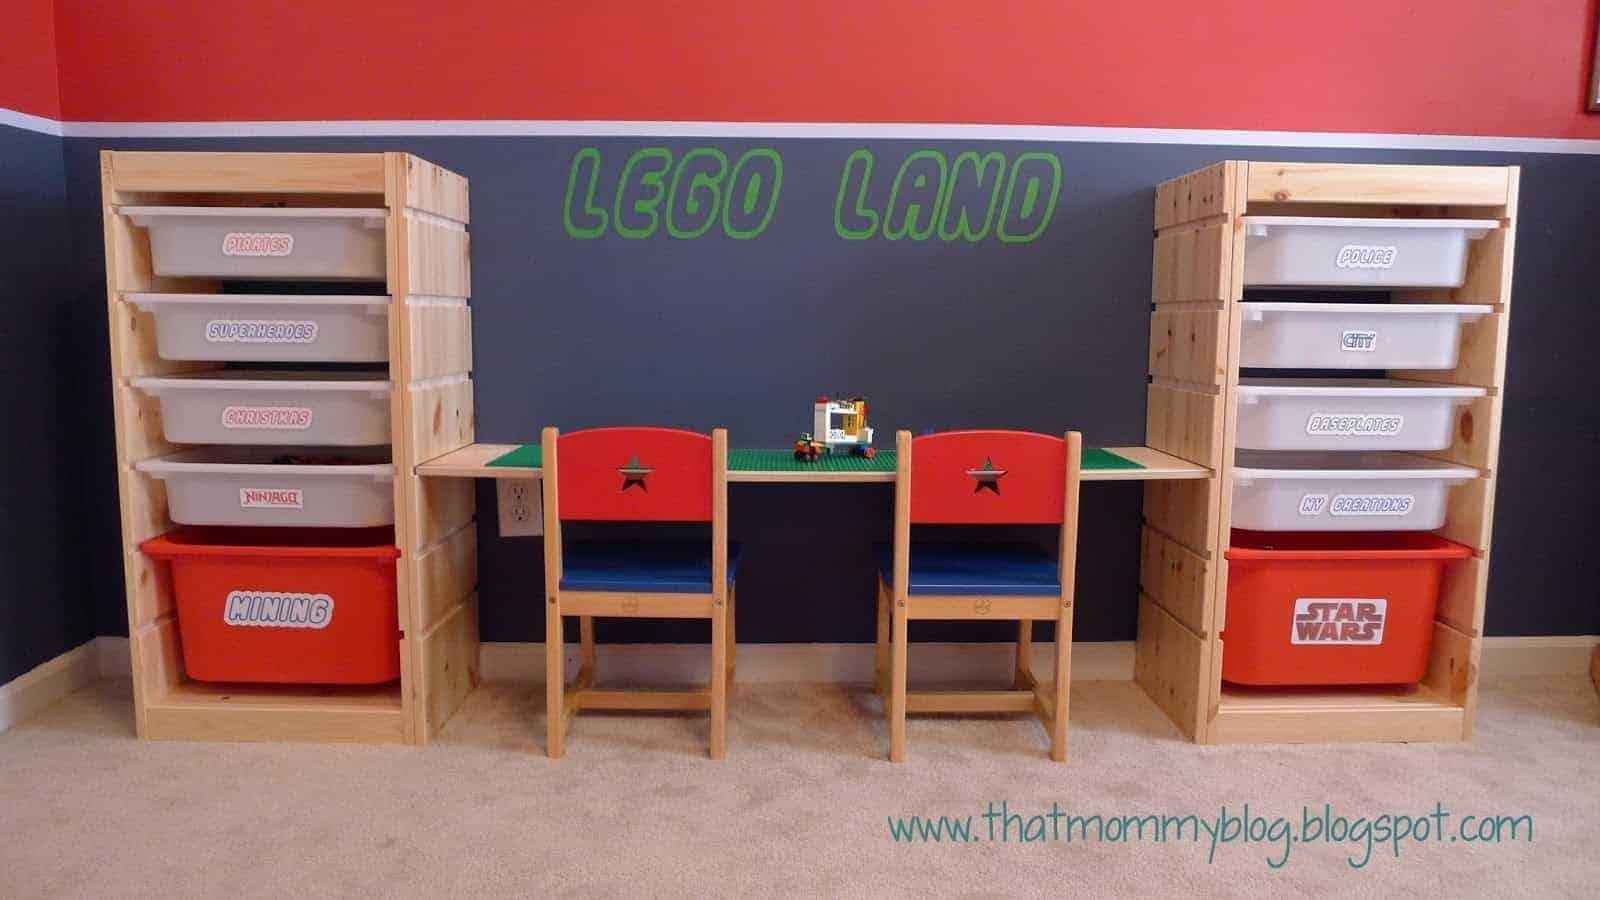 Lego Storage Ideas | AWESOME Lego storage ideas to keep your kids sets, minifigs and pieces organized.